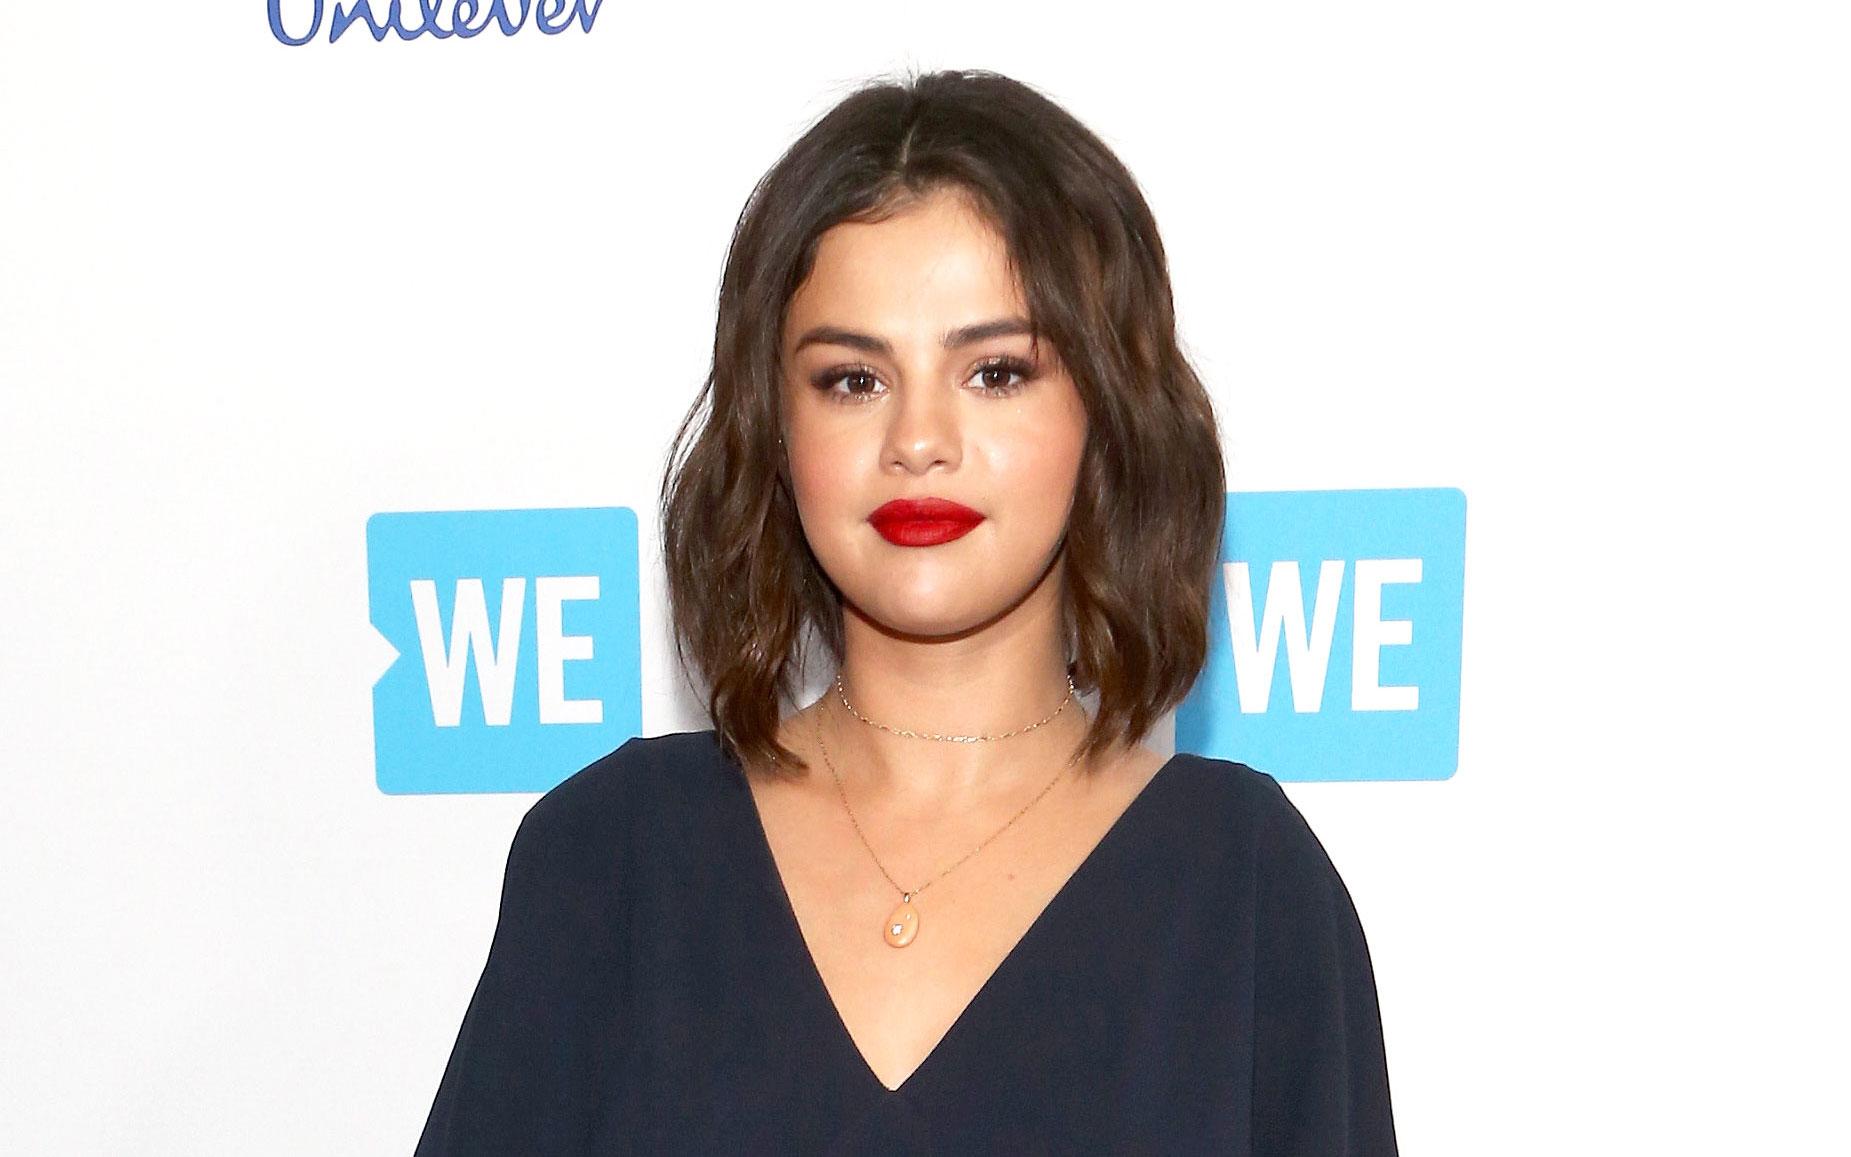 Selena Gomezs New Bangs And Bob Haircut Pics